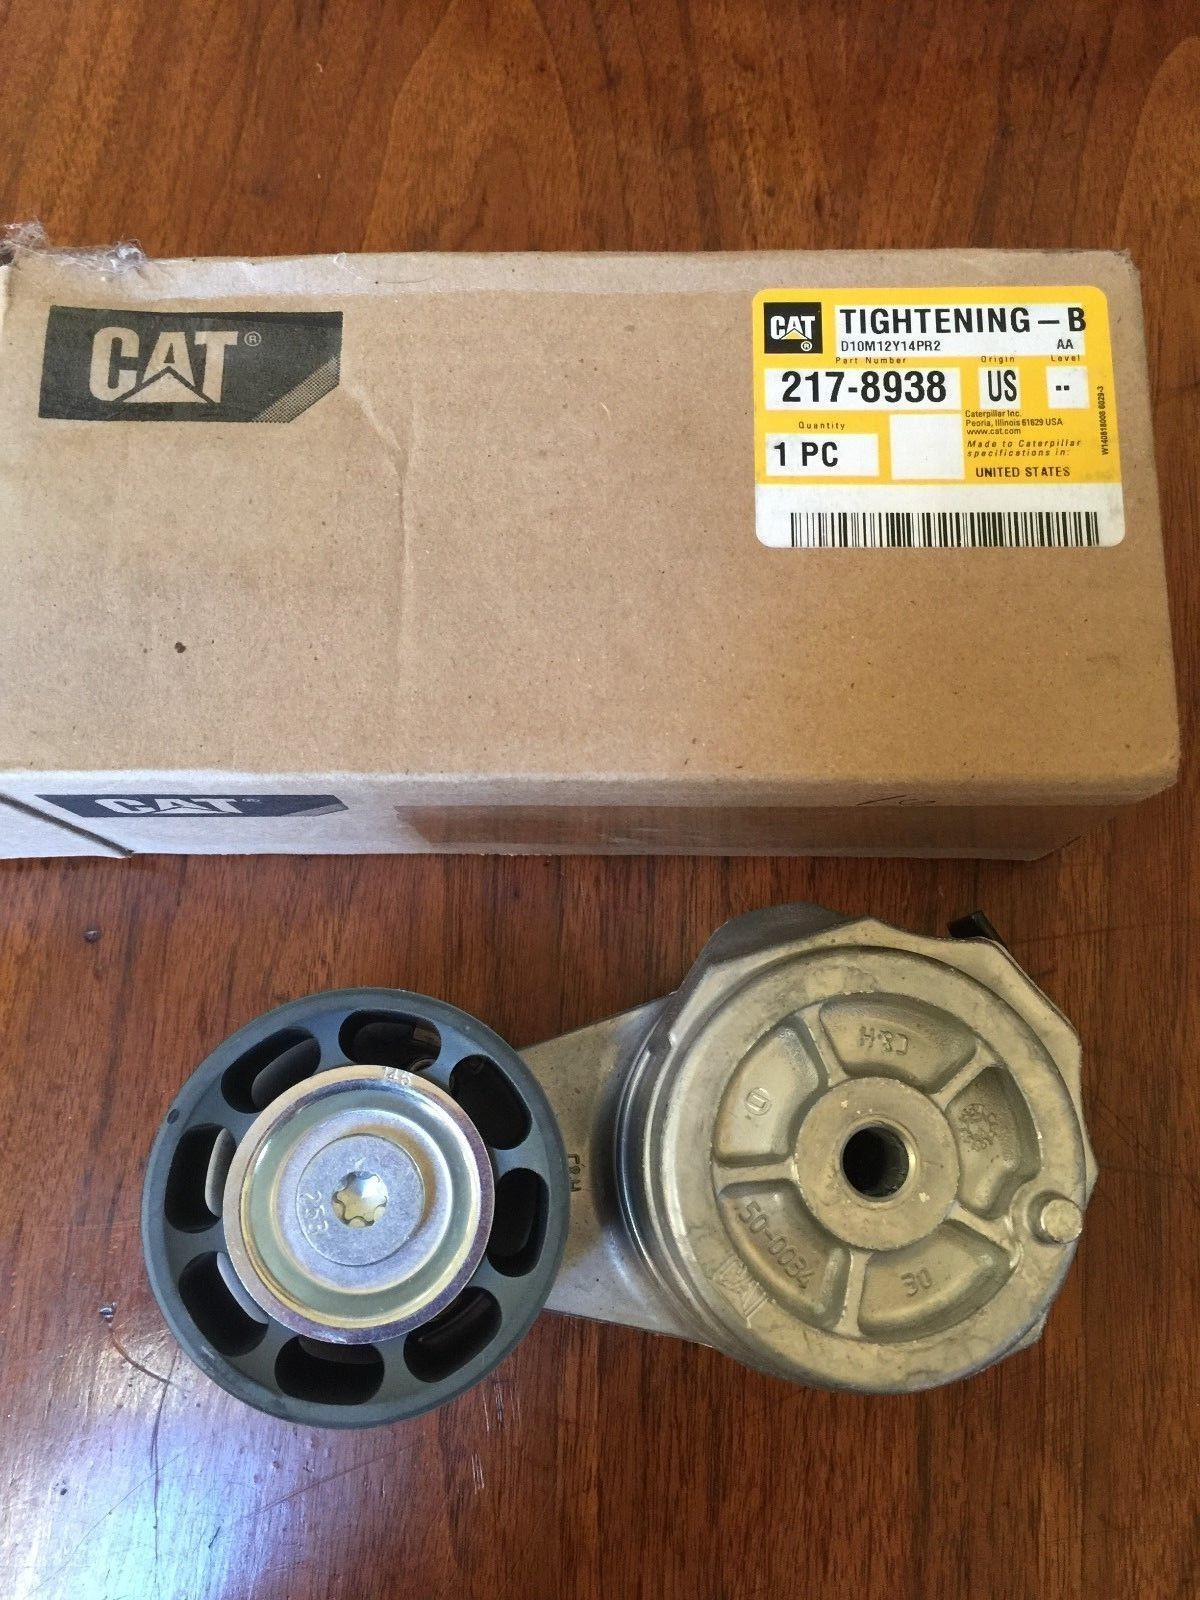 Available On Ebay Caterpillar 217 Belt Tensioner Cat